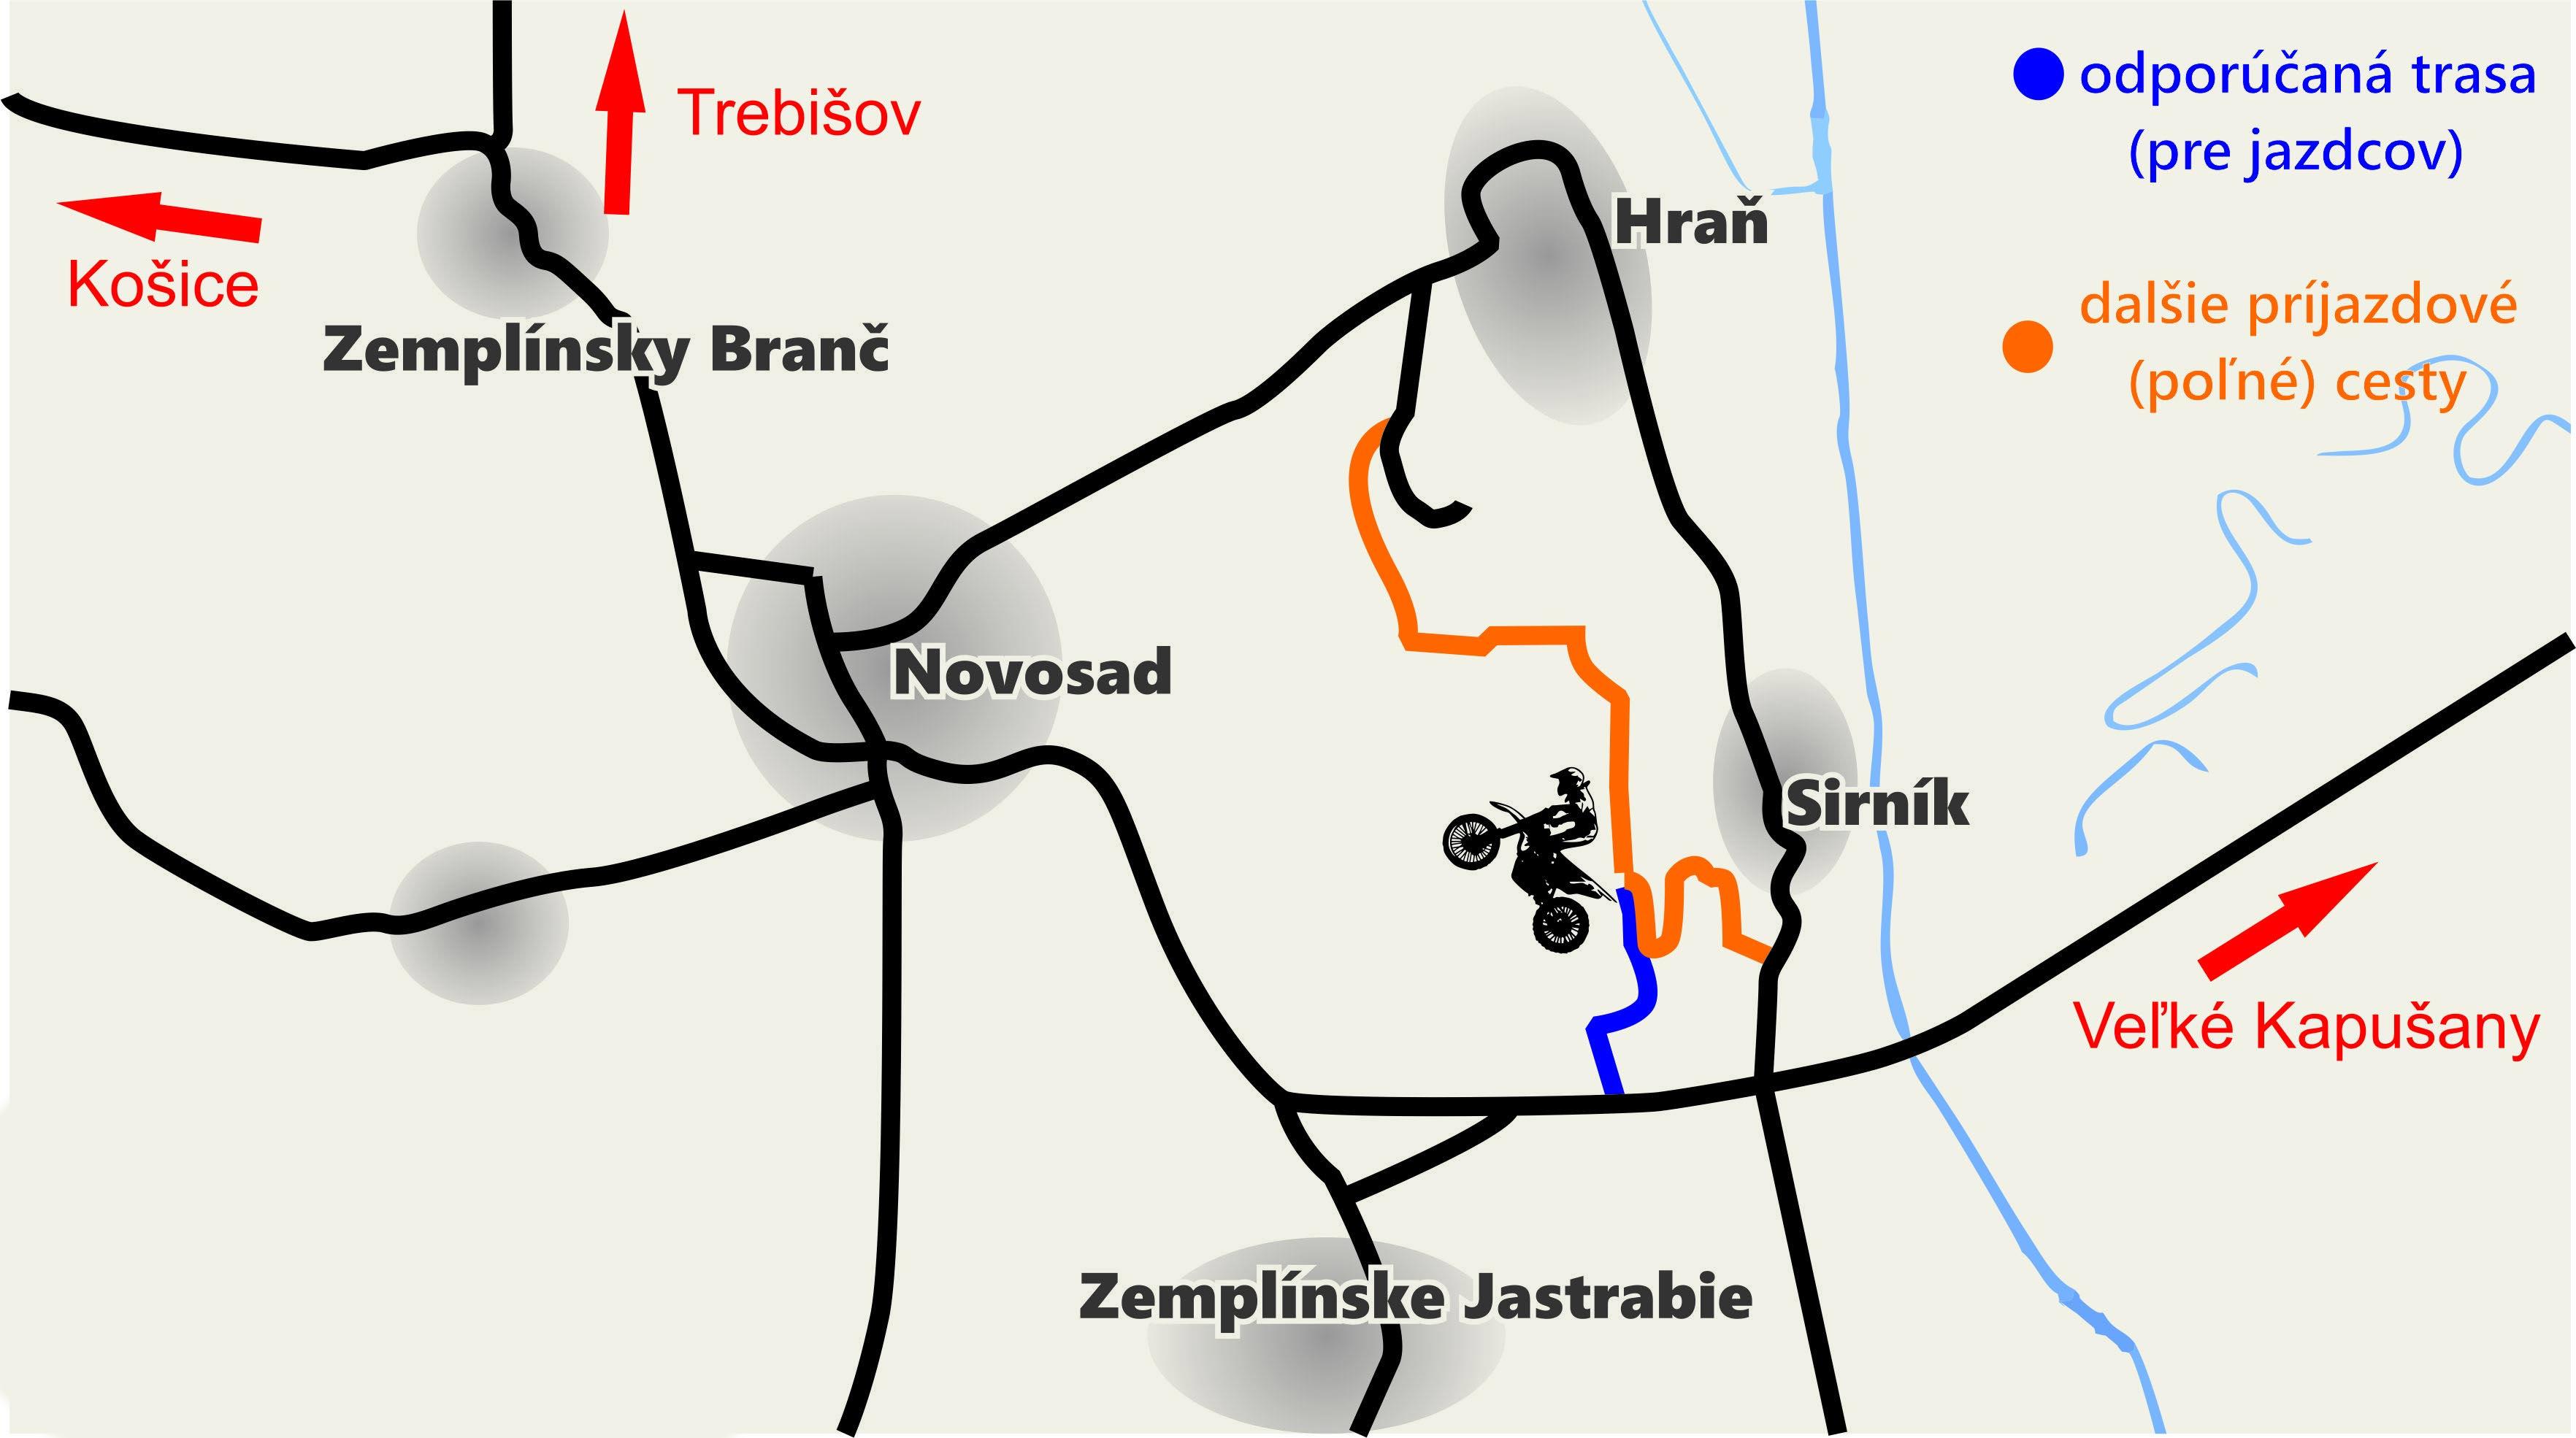 mapa prijazdovych ciest